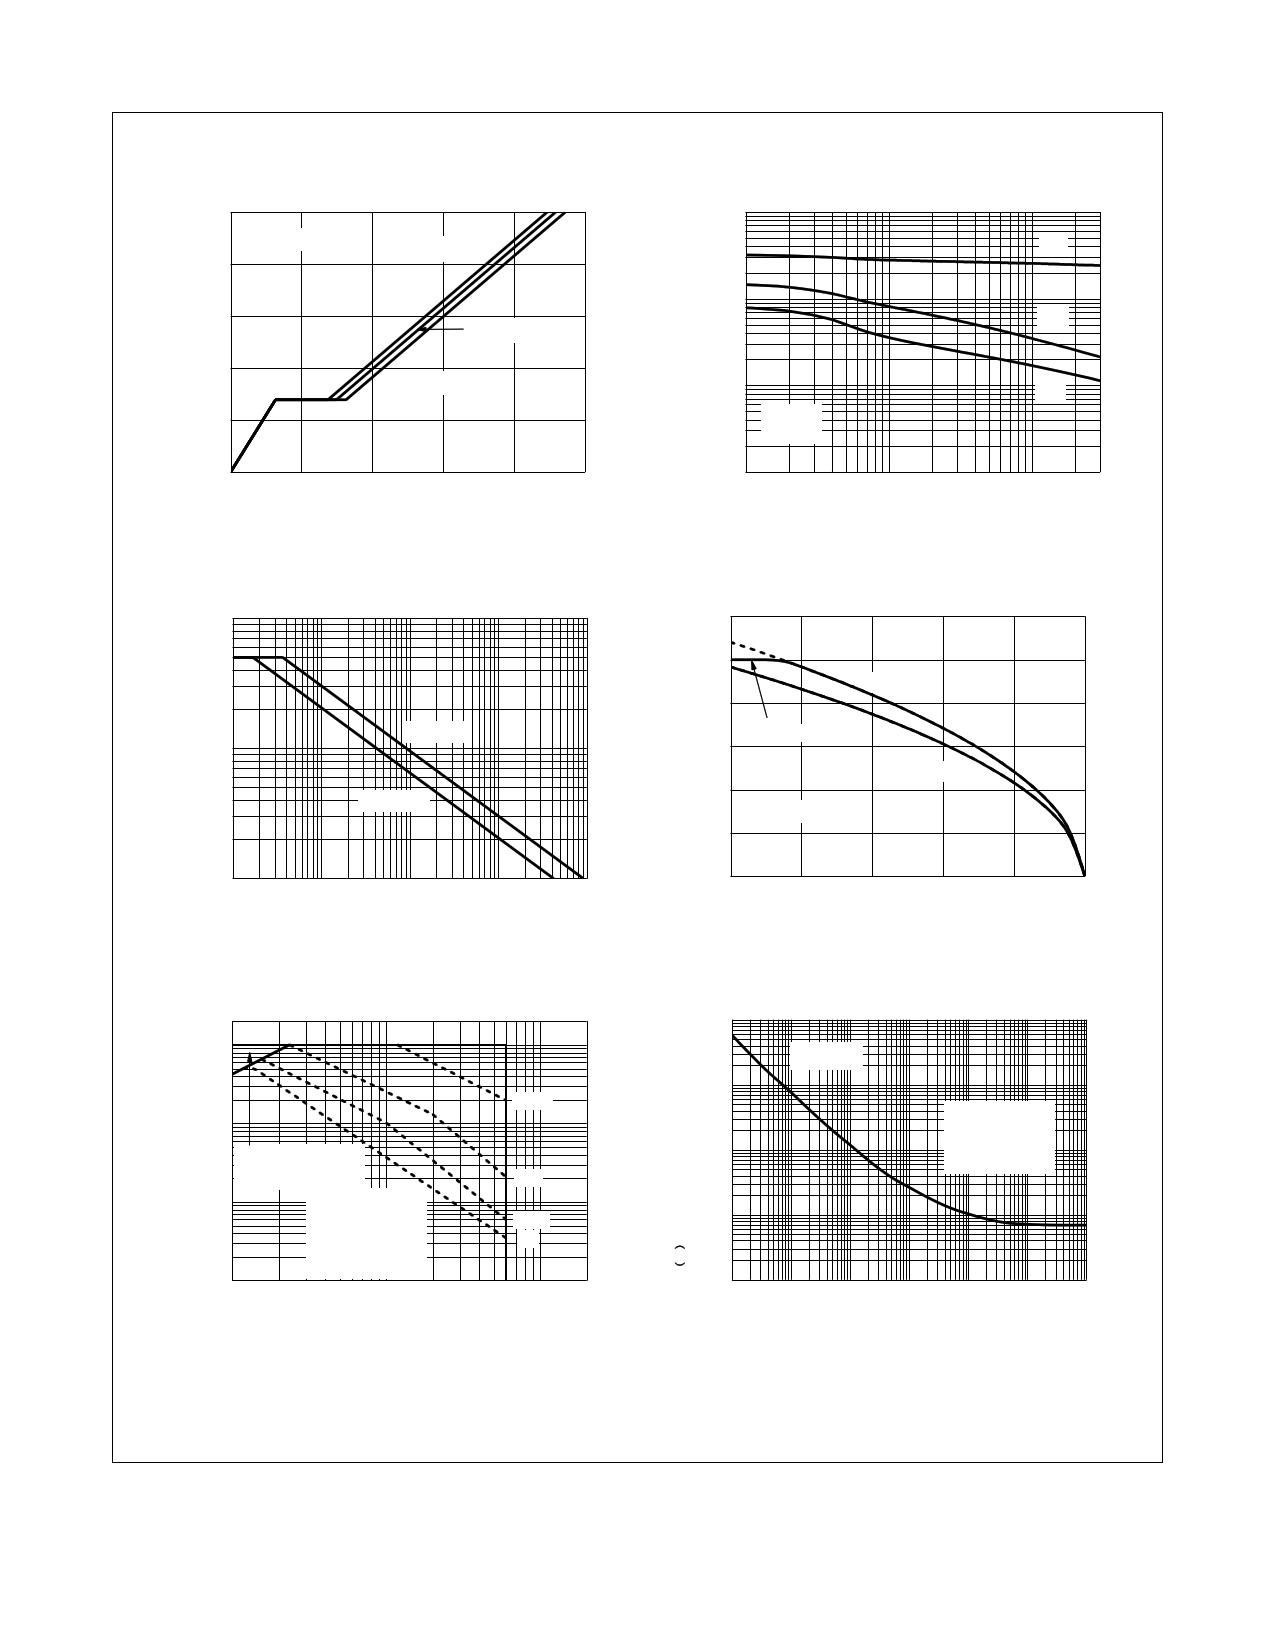 FDD5353 pdf, 반도체, 판매, 대치품